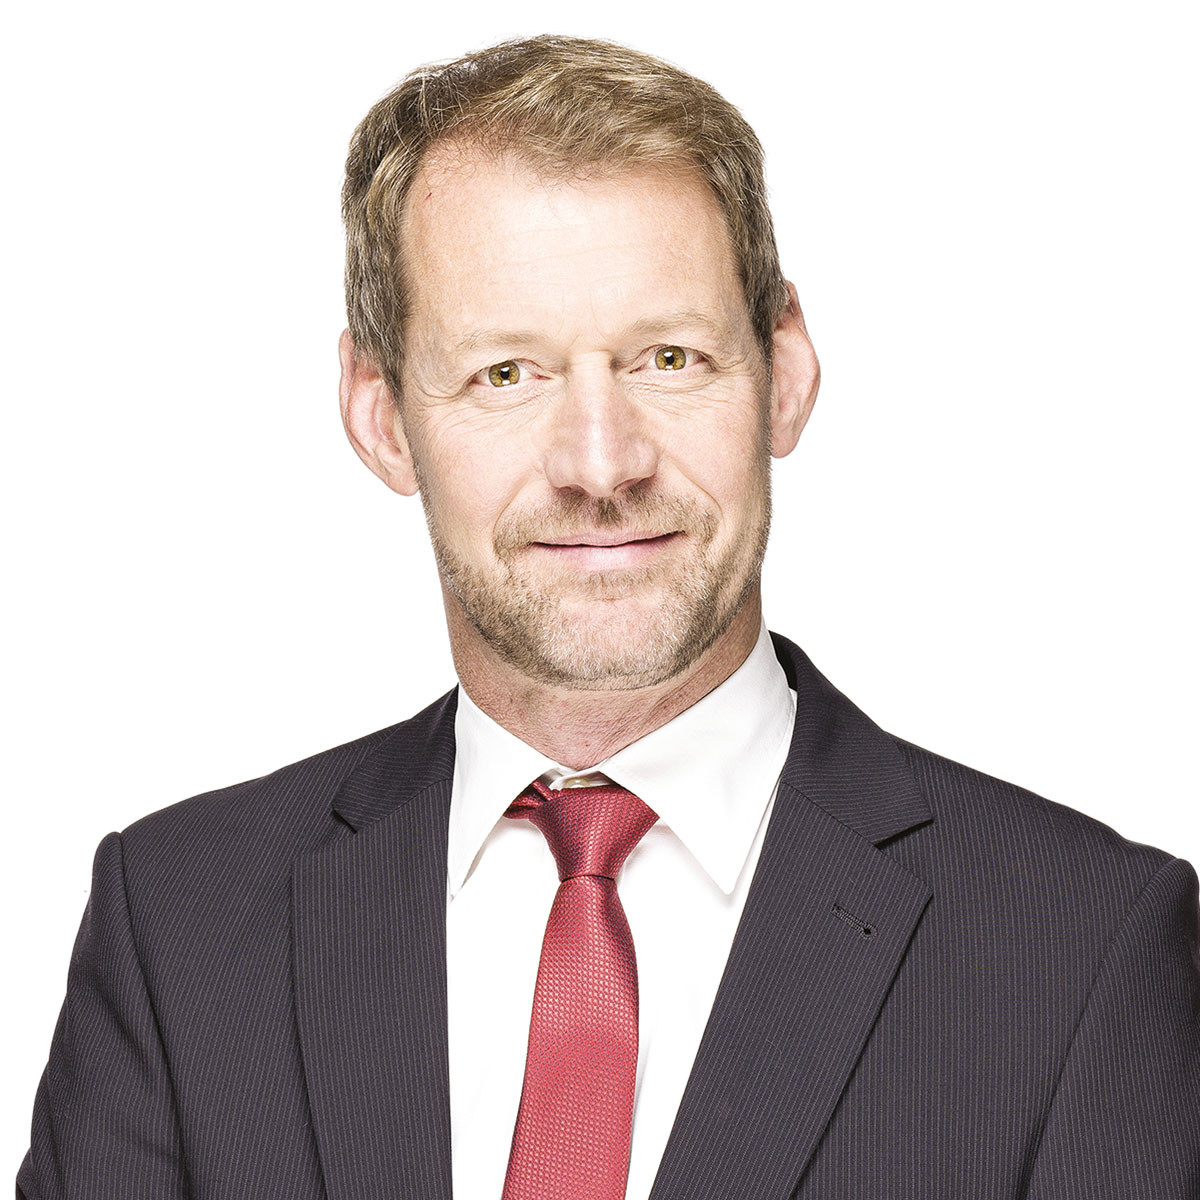 Oliver Schluep